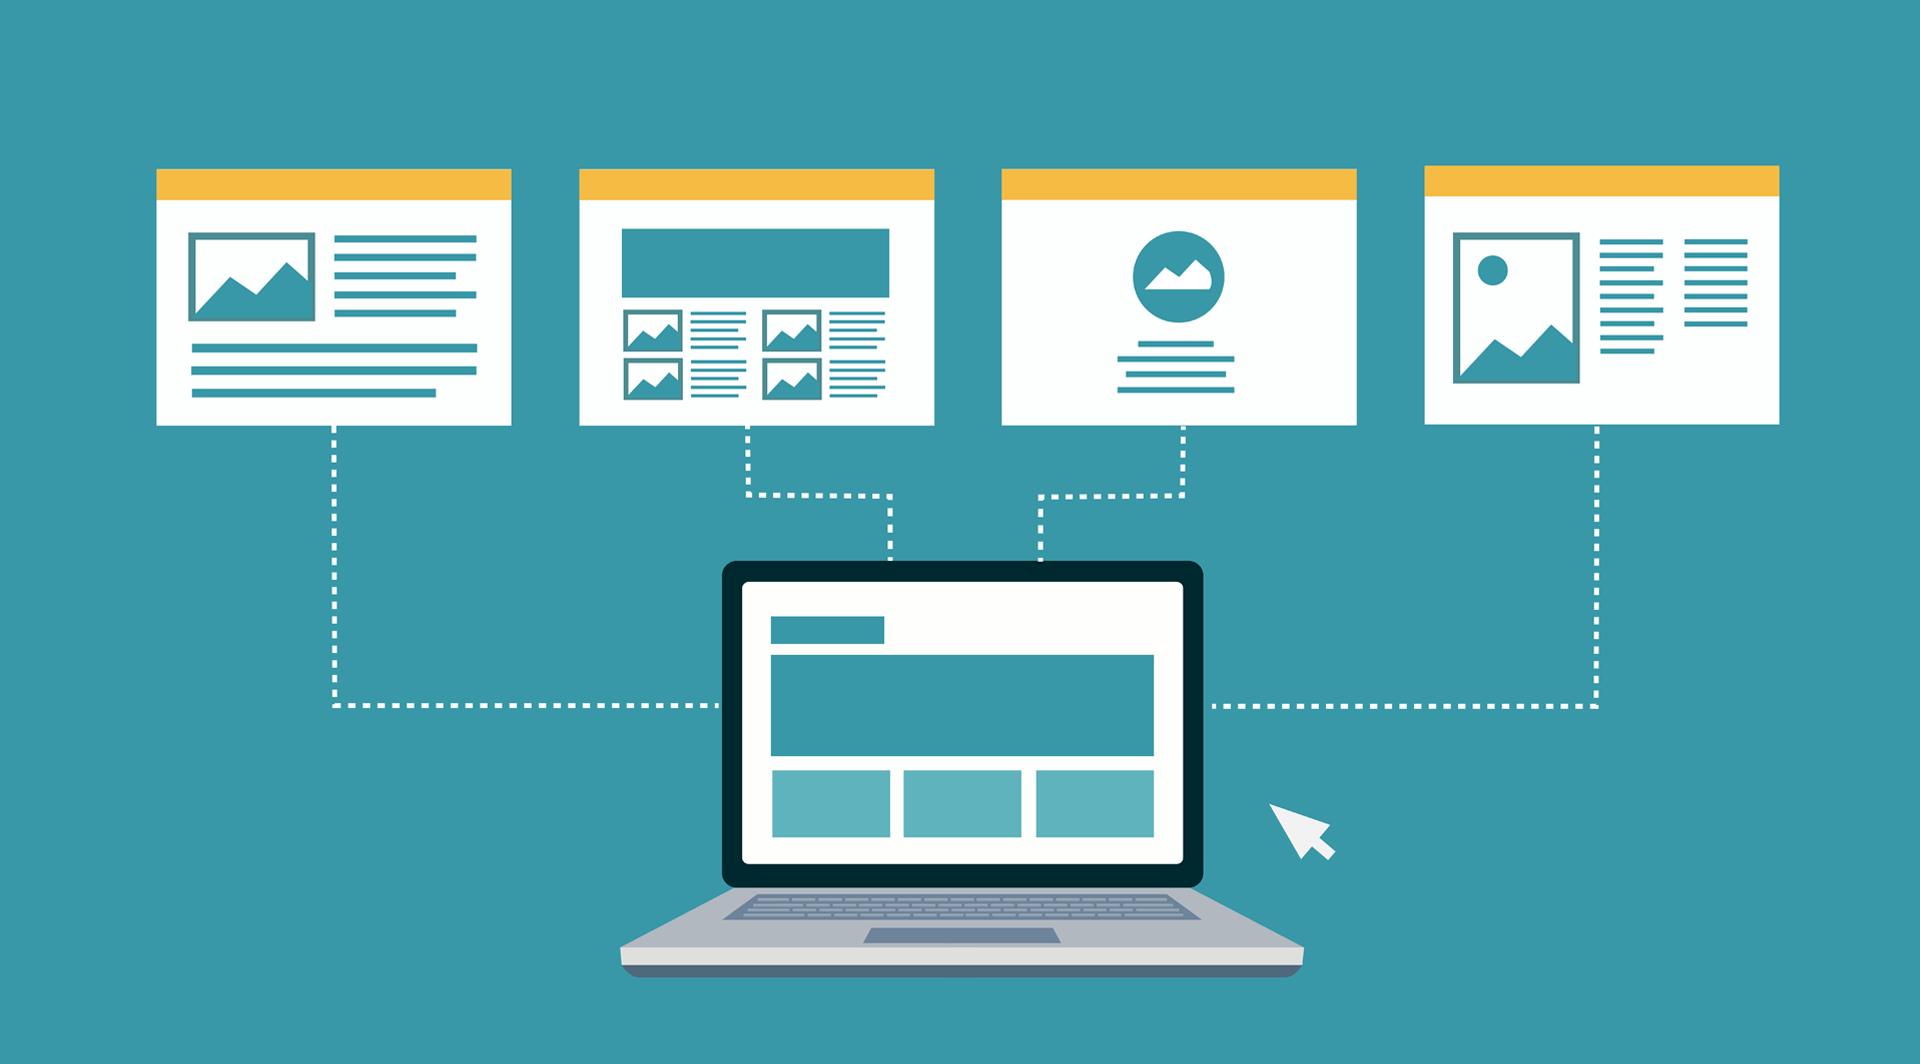 Wordpress Content Management Systeem (CMS)